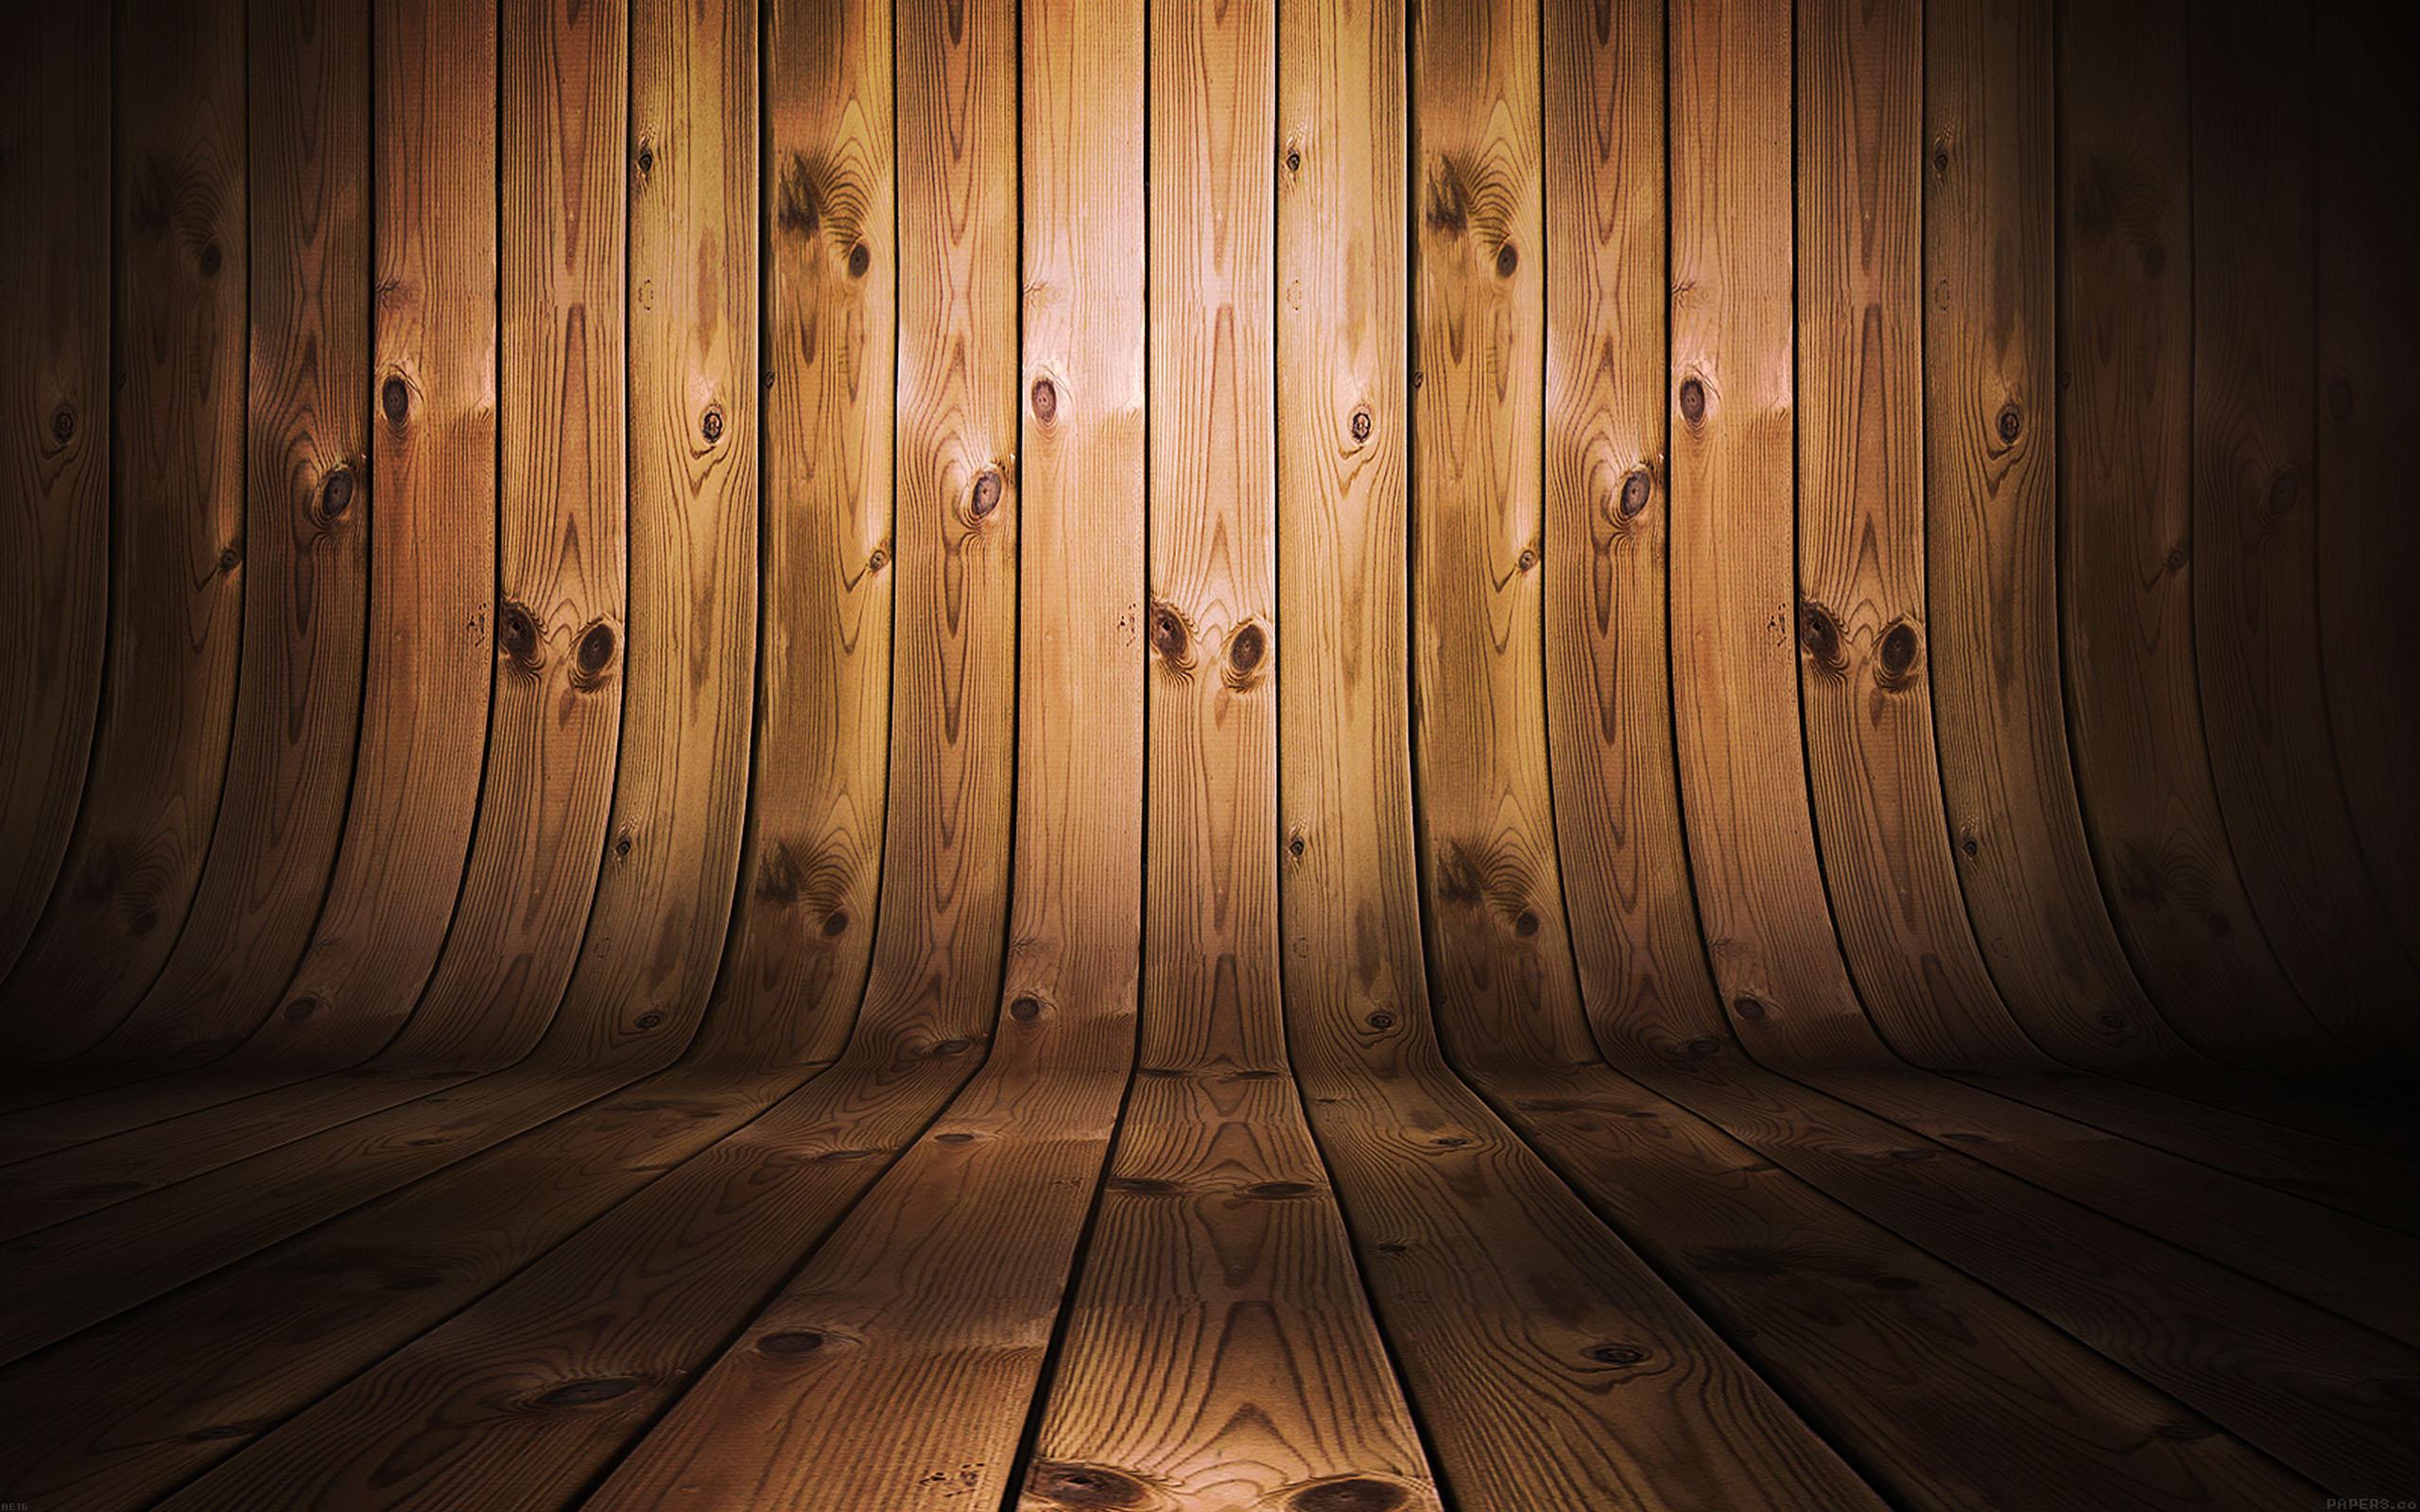 Ae16-dark-bent-red-wood-background